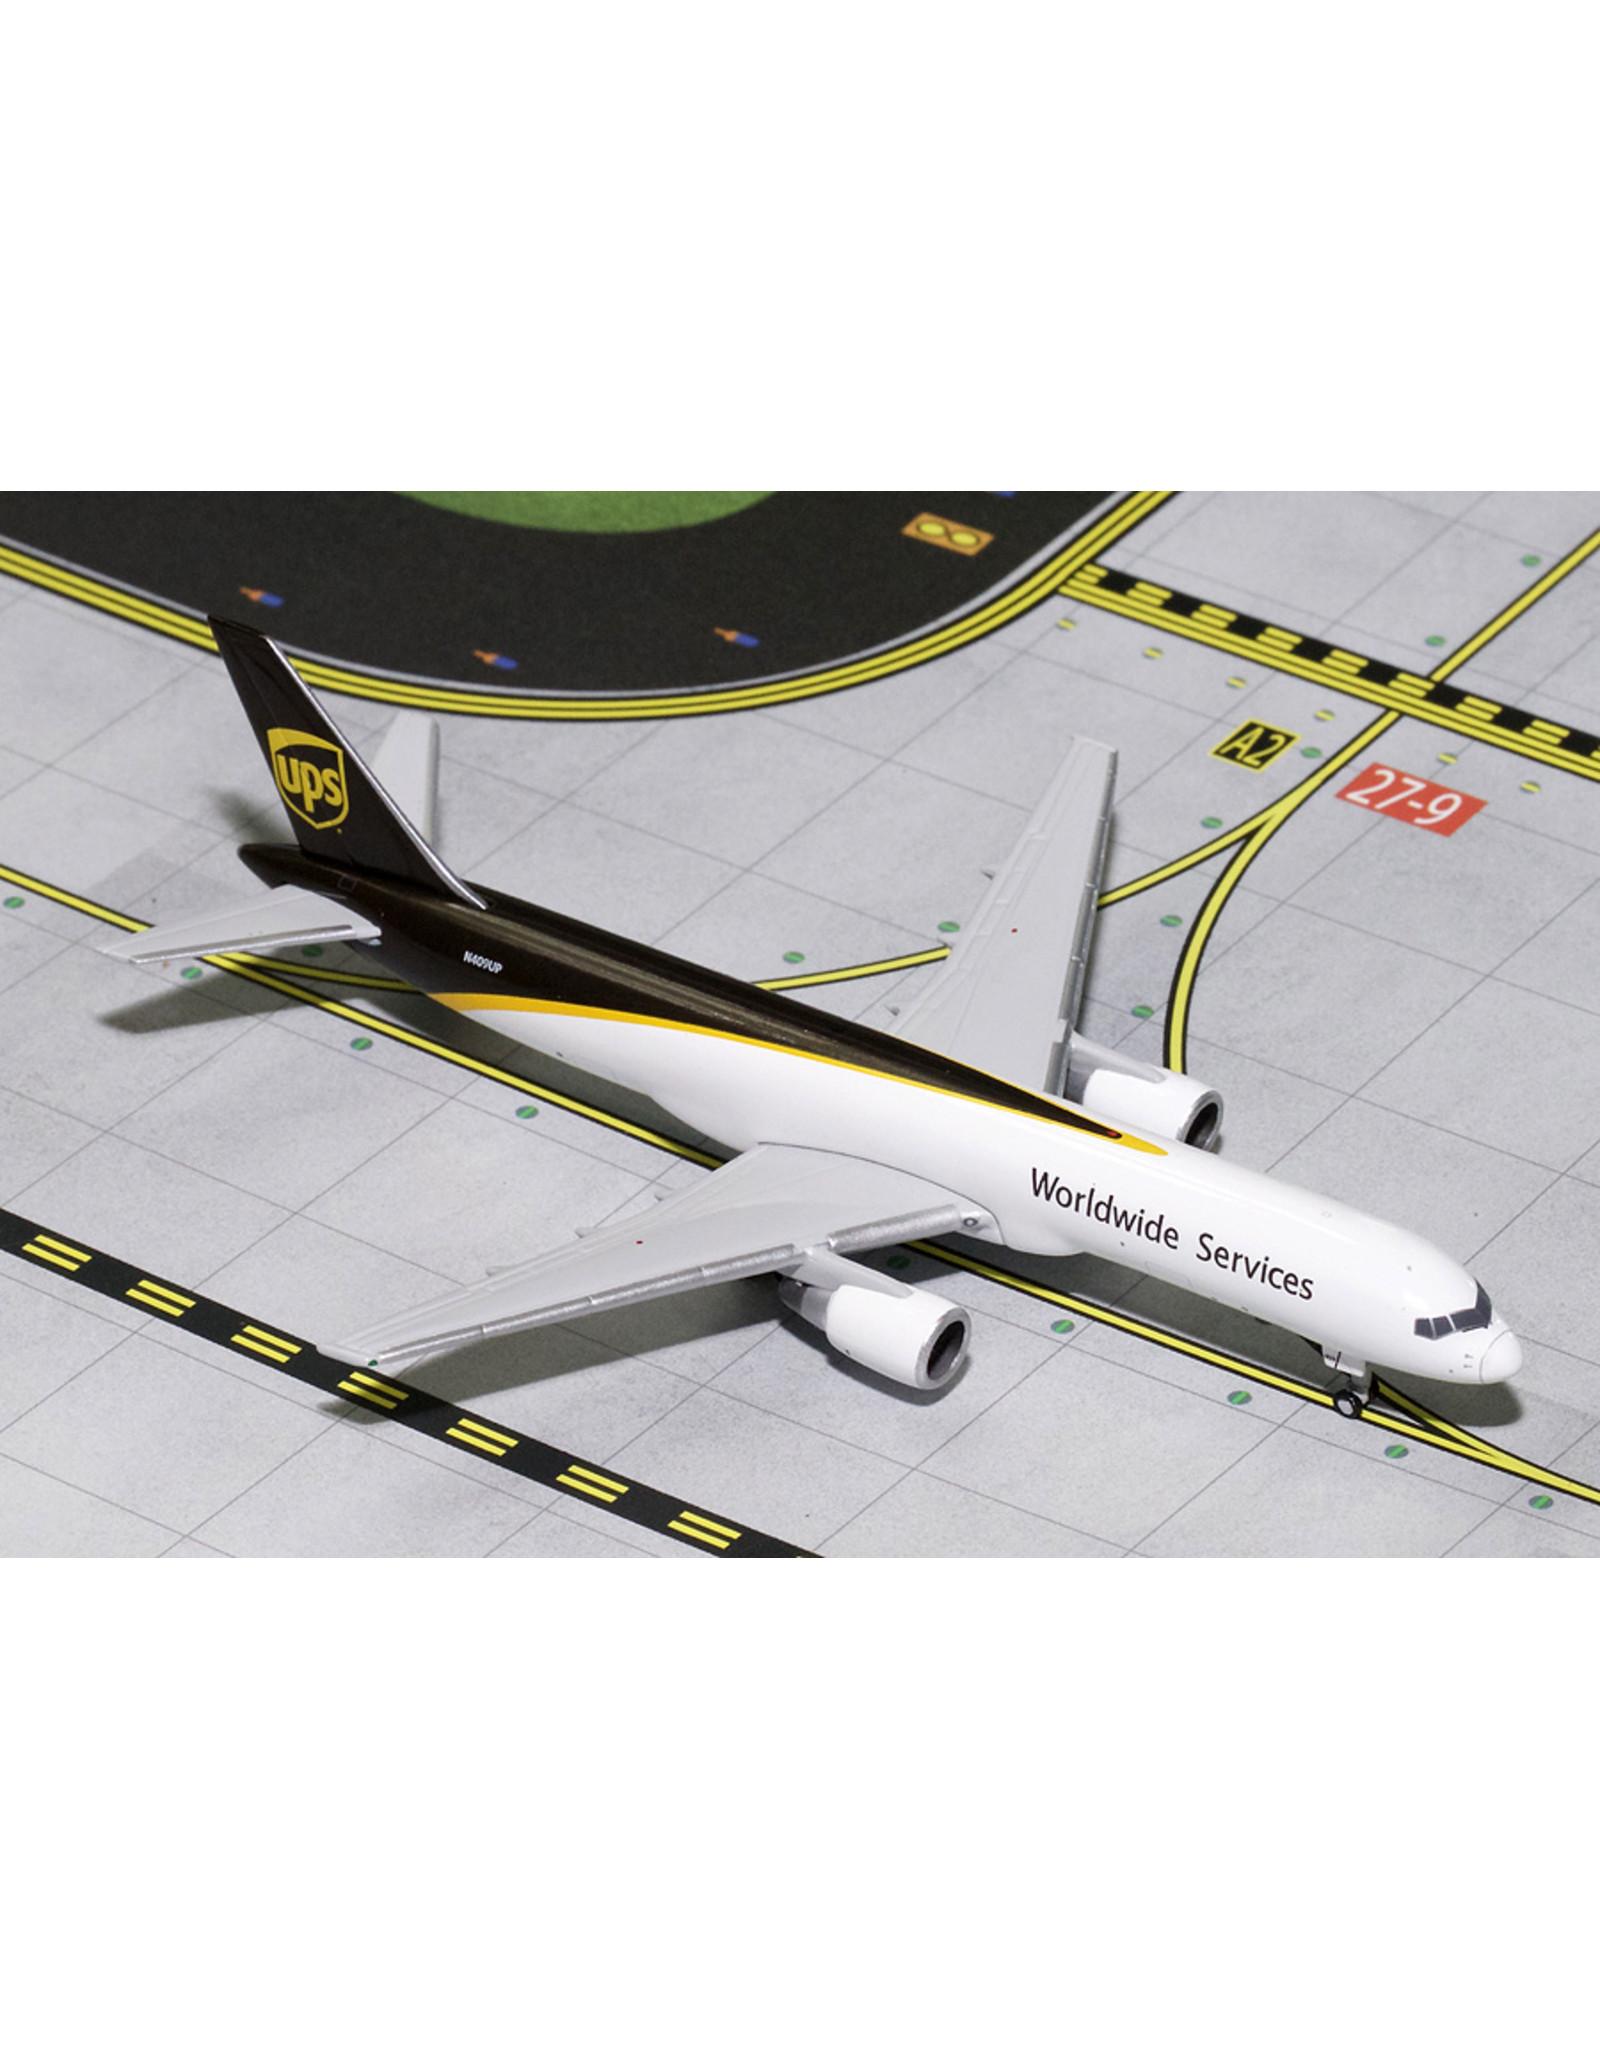 Gem4 UPS 757-200F new